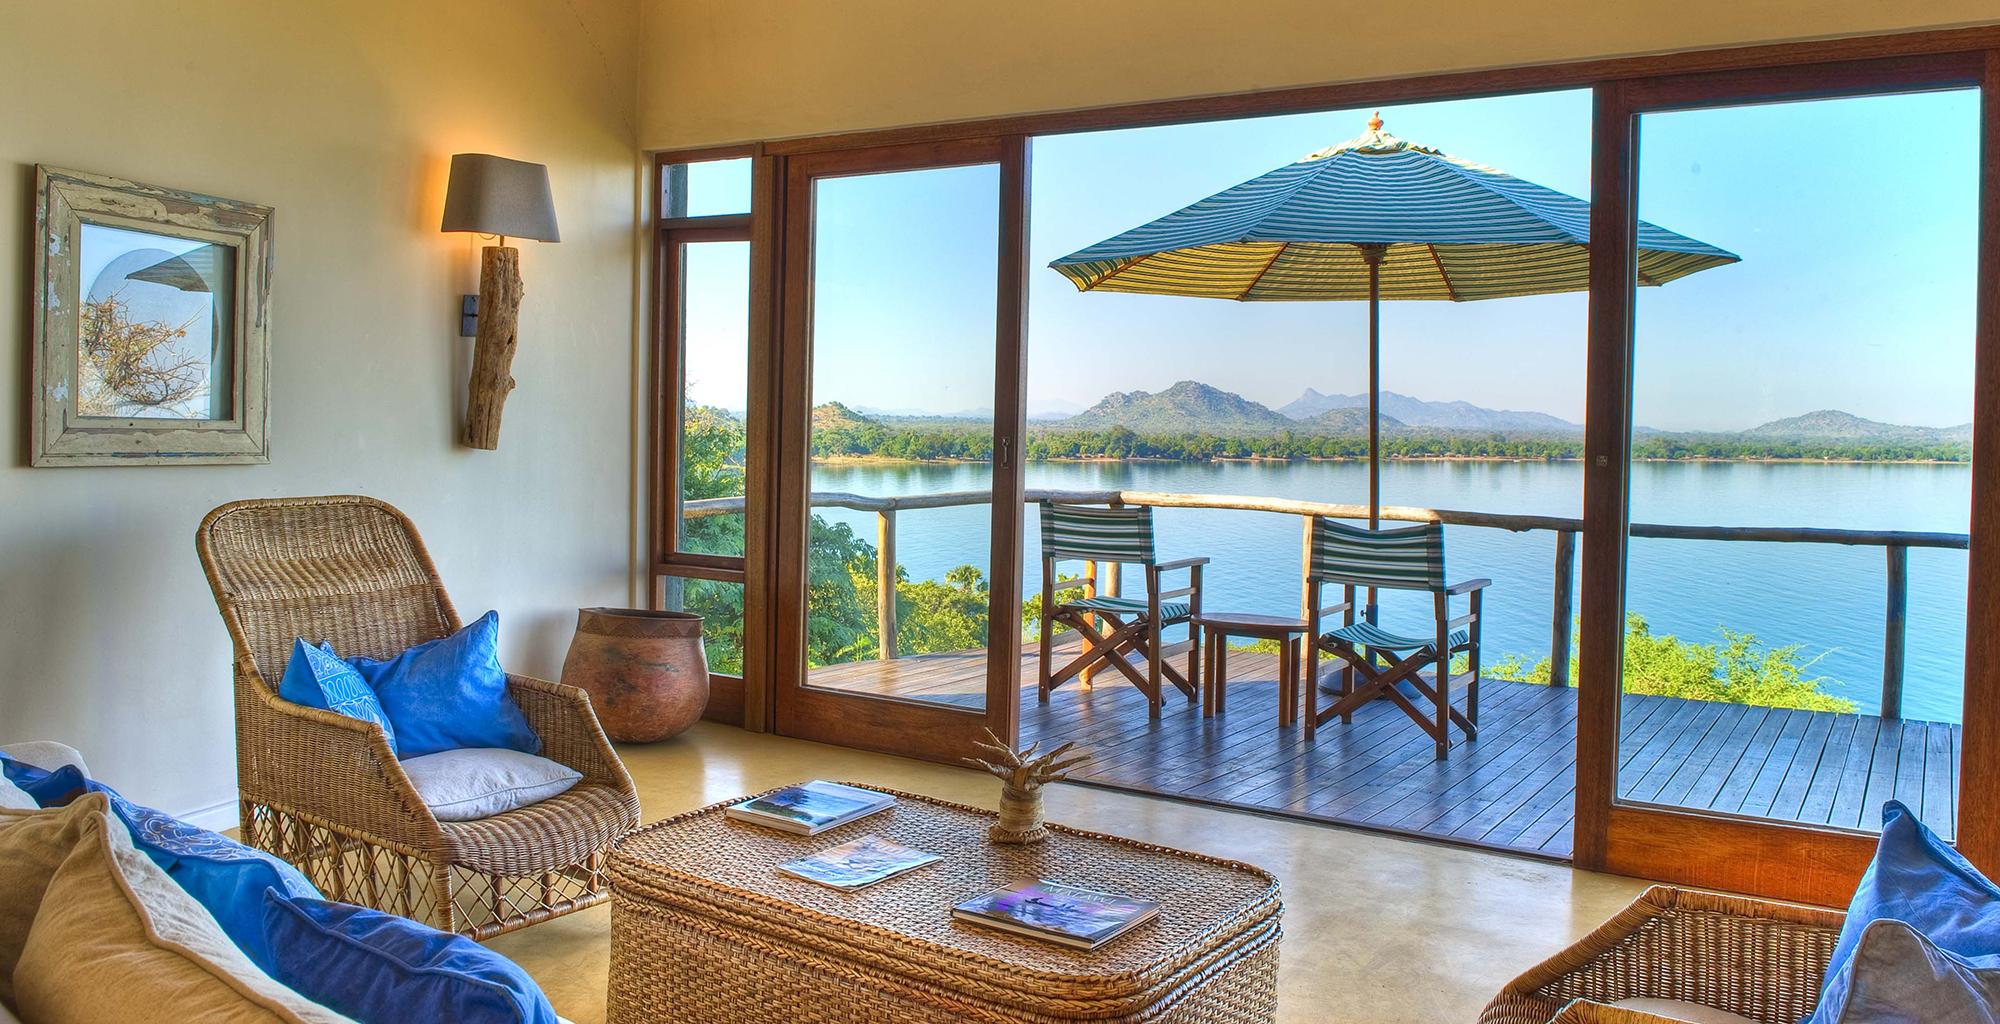 Lake-Malawi-Pumulani-Beach-Lodge-Bedroom-View